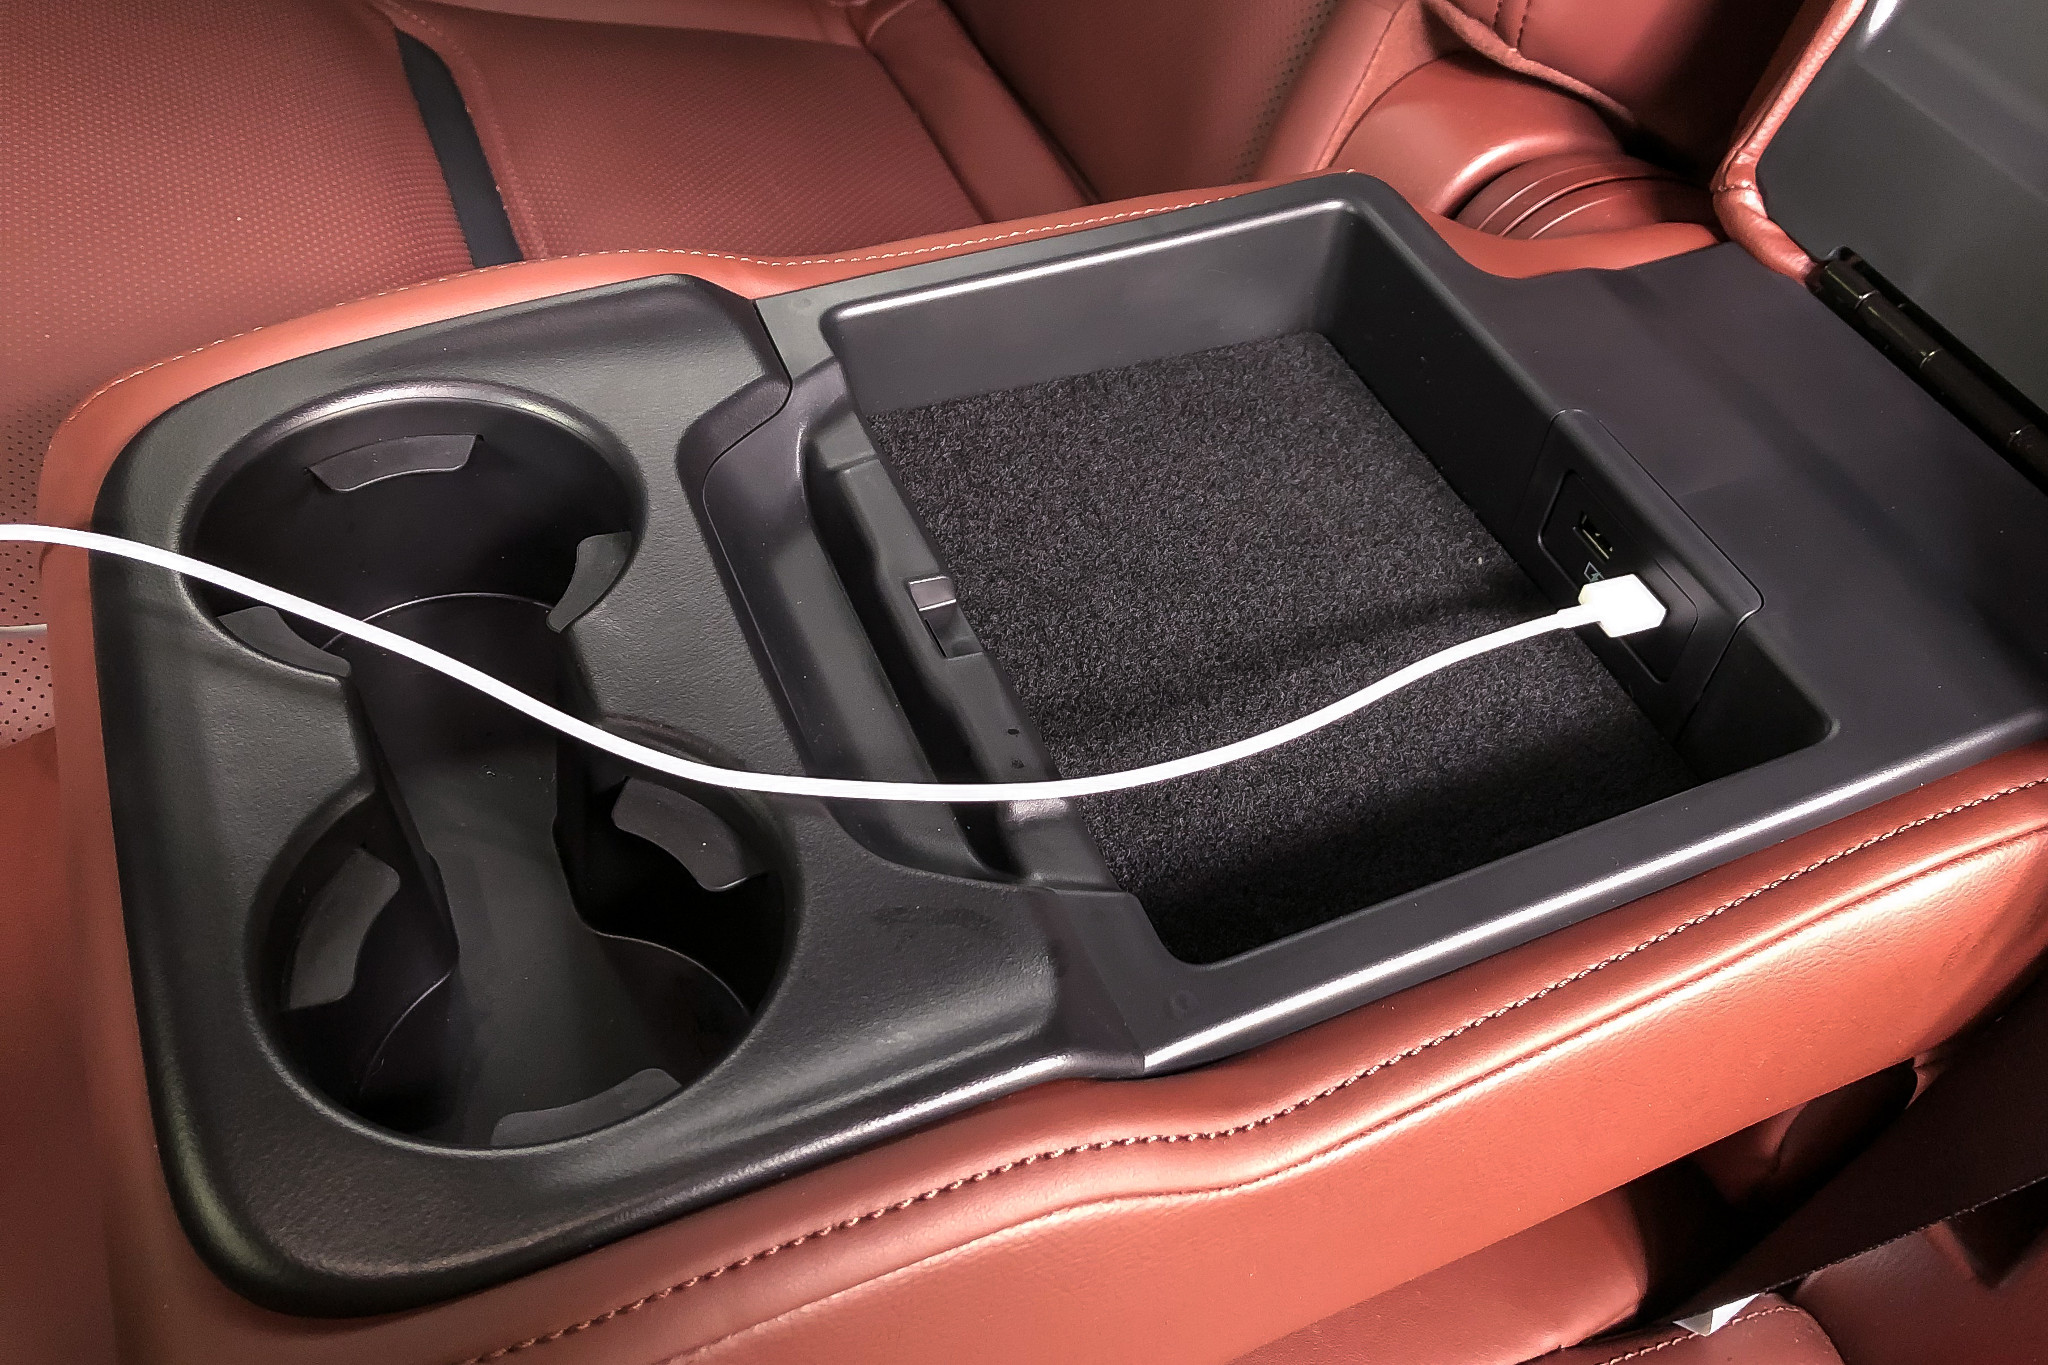 Smart Solution: 2019 Mazda CX-9's Armrest USB Ports